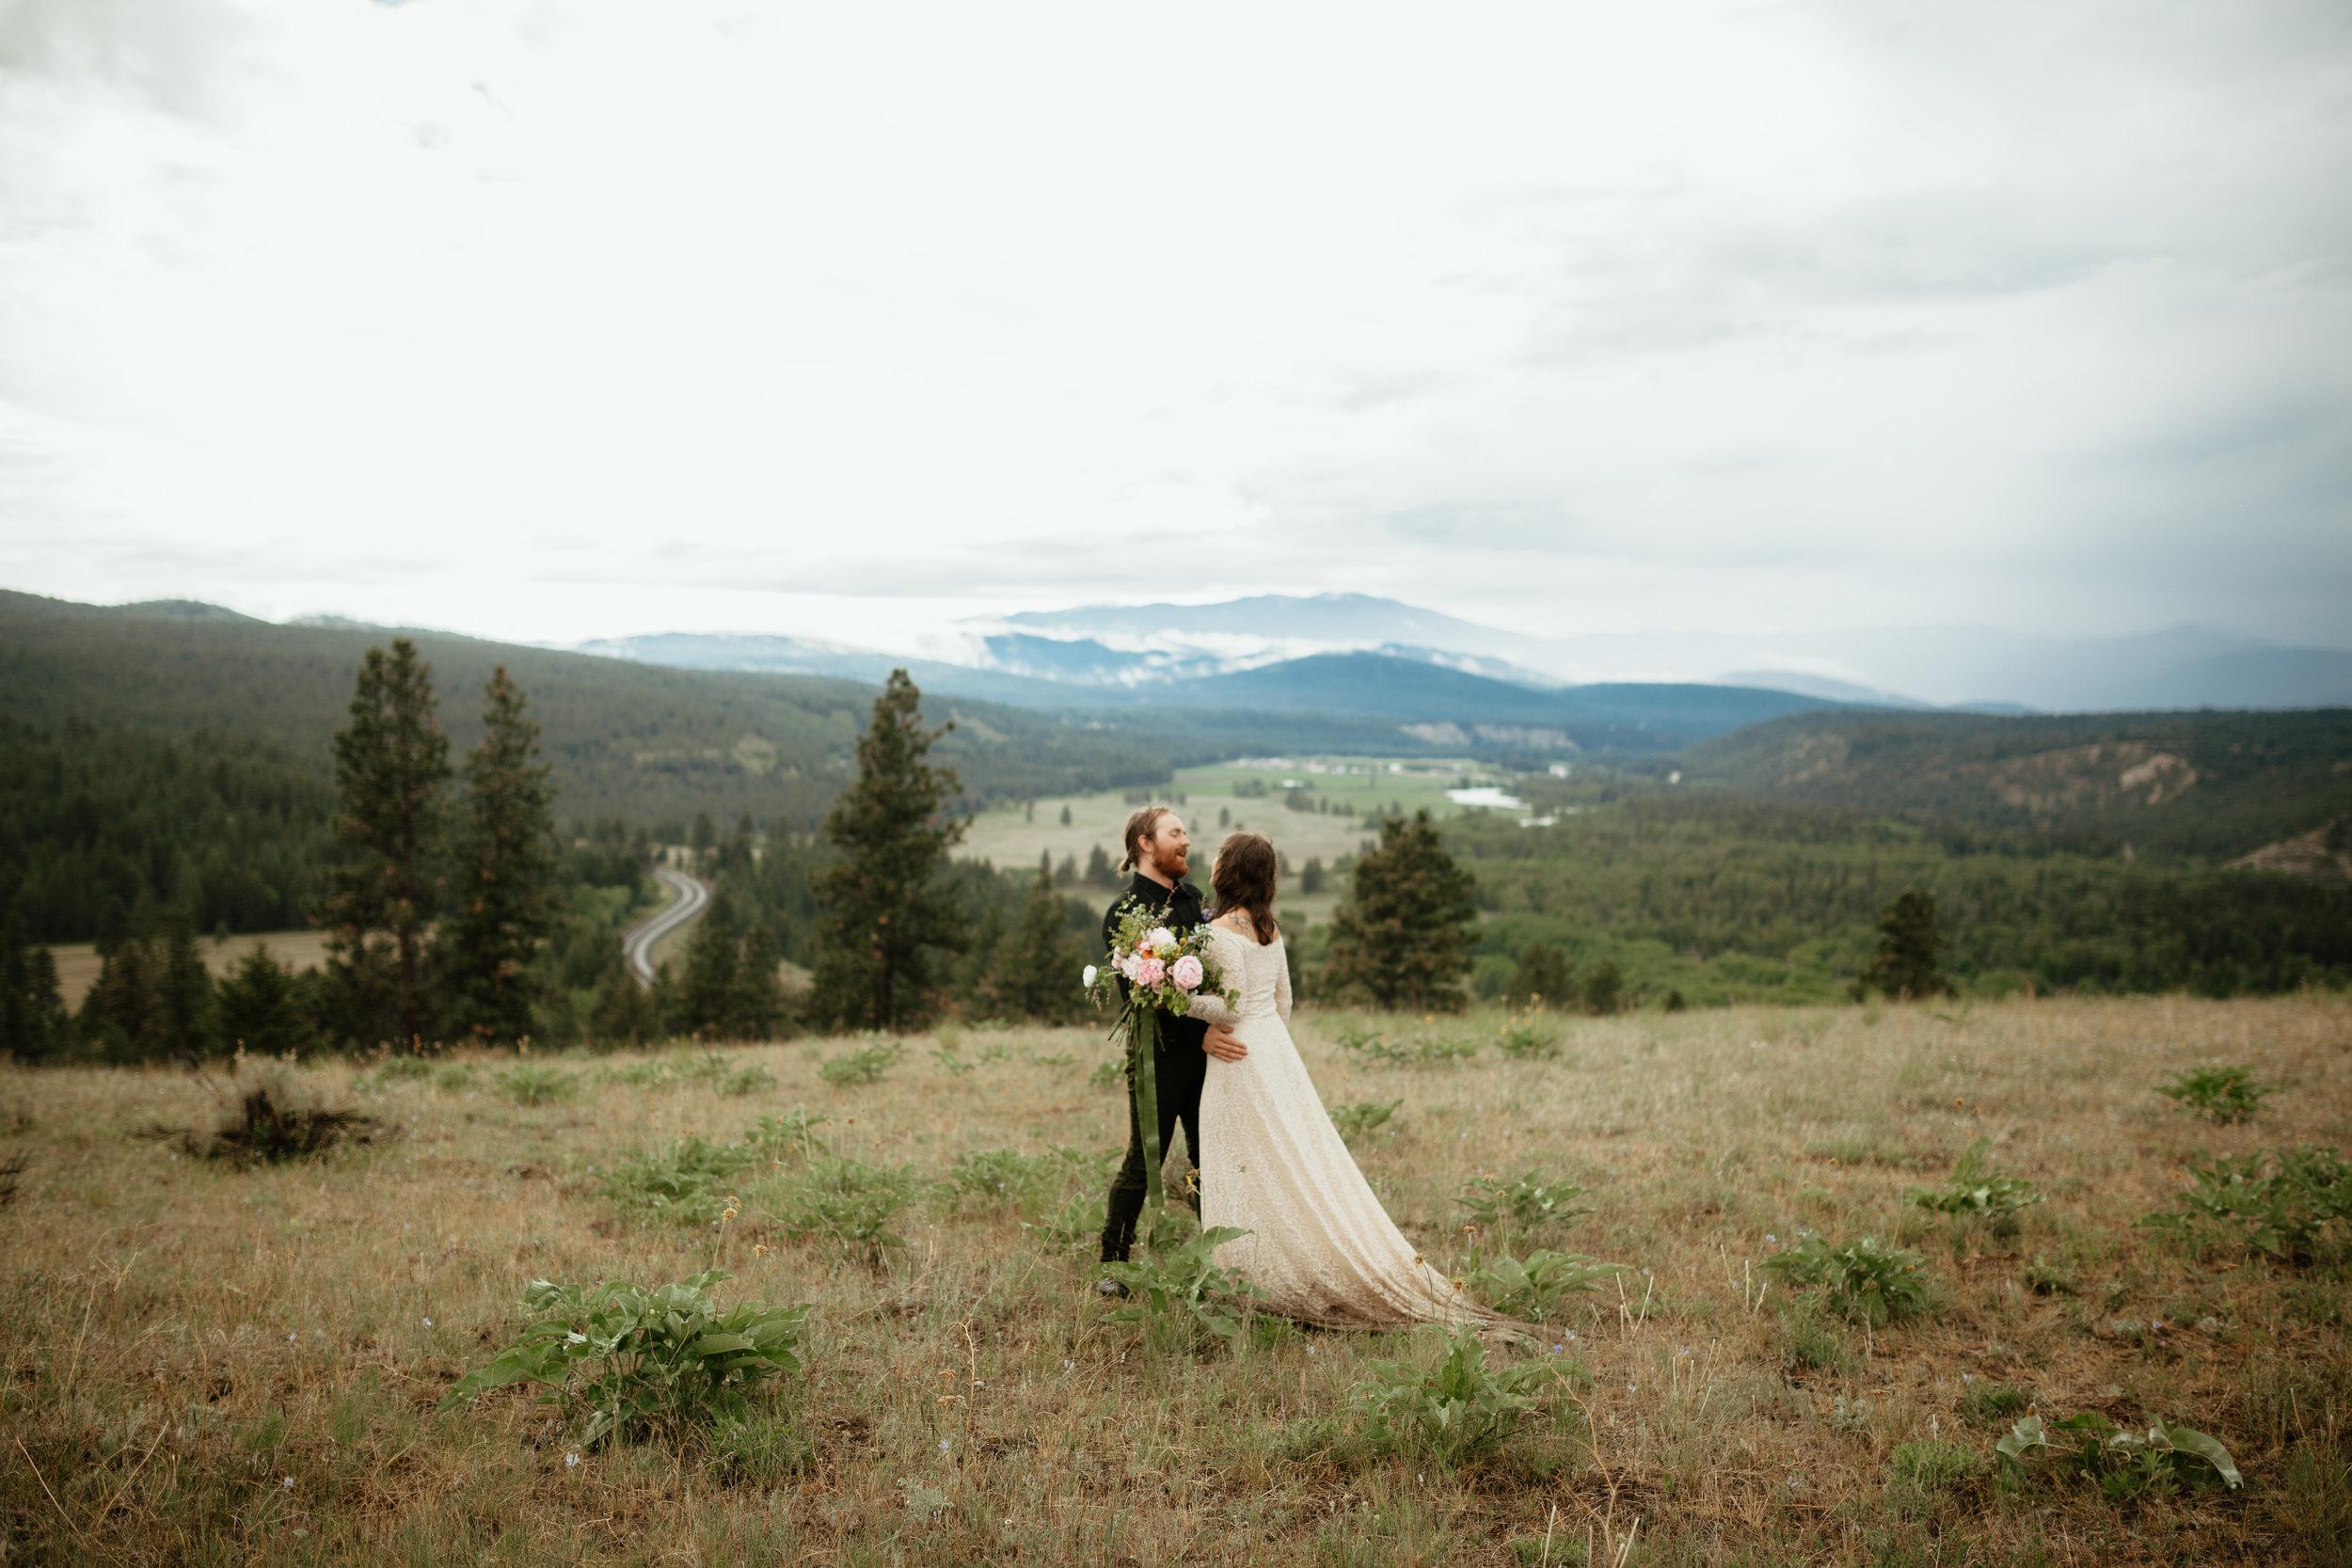 Casey + Anna 3 - Bridal Portraits-109.jpg